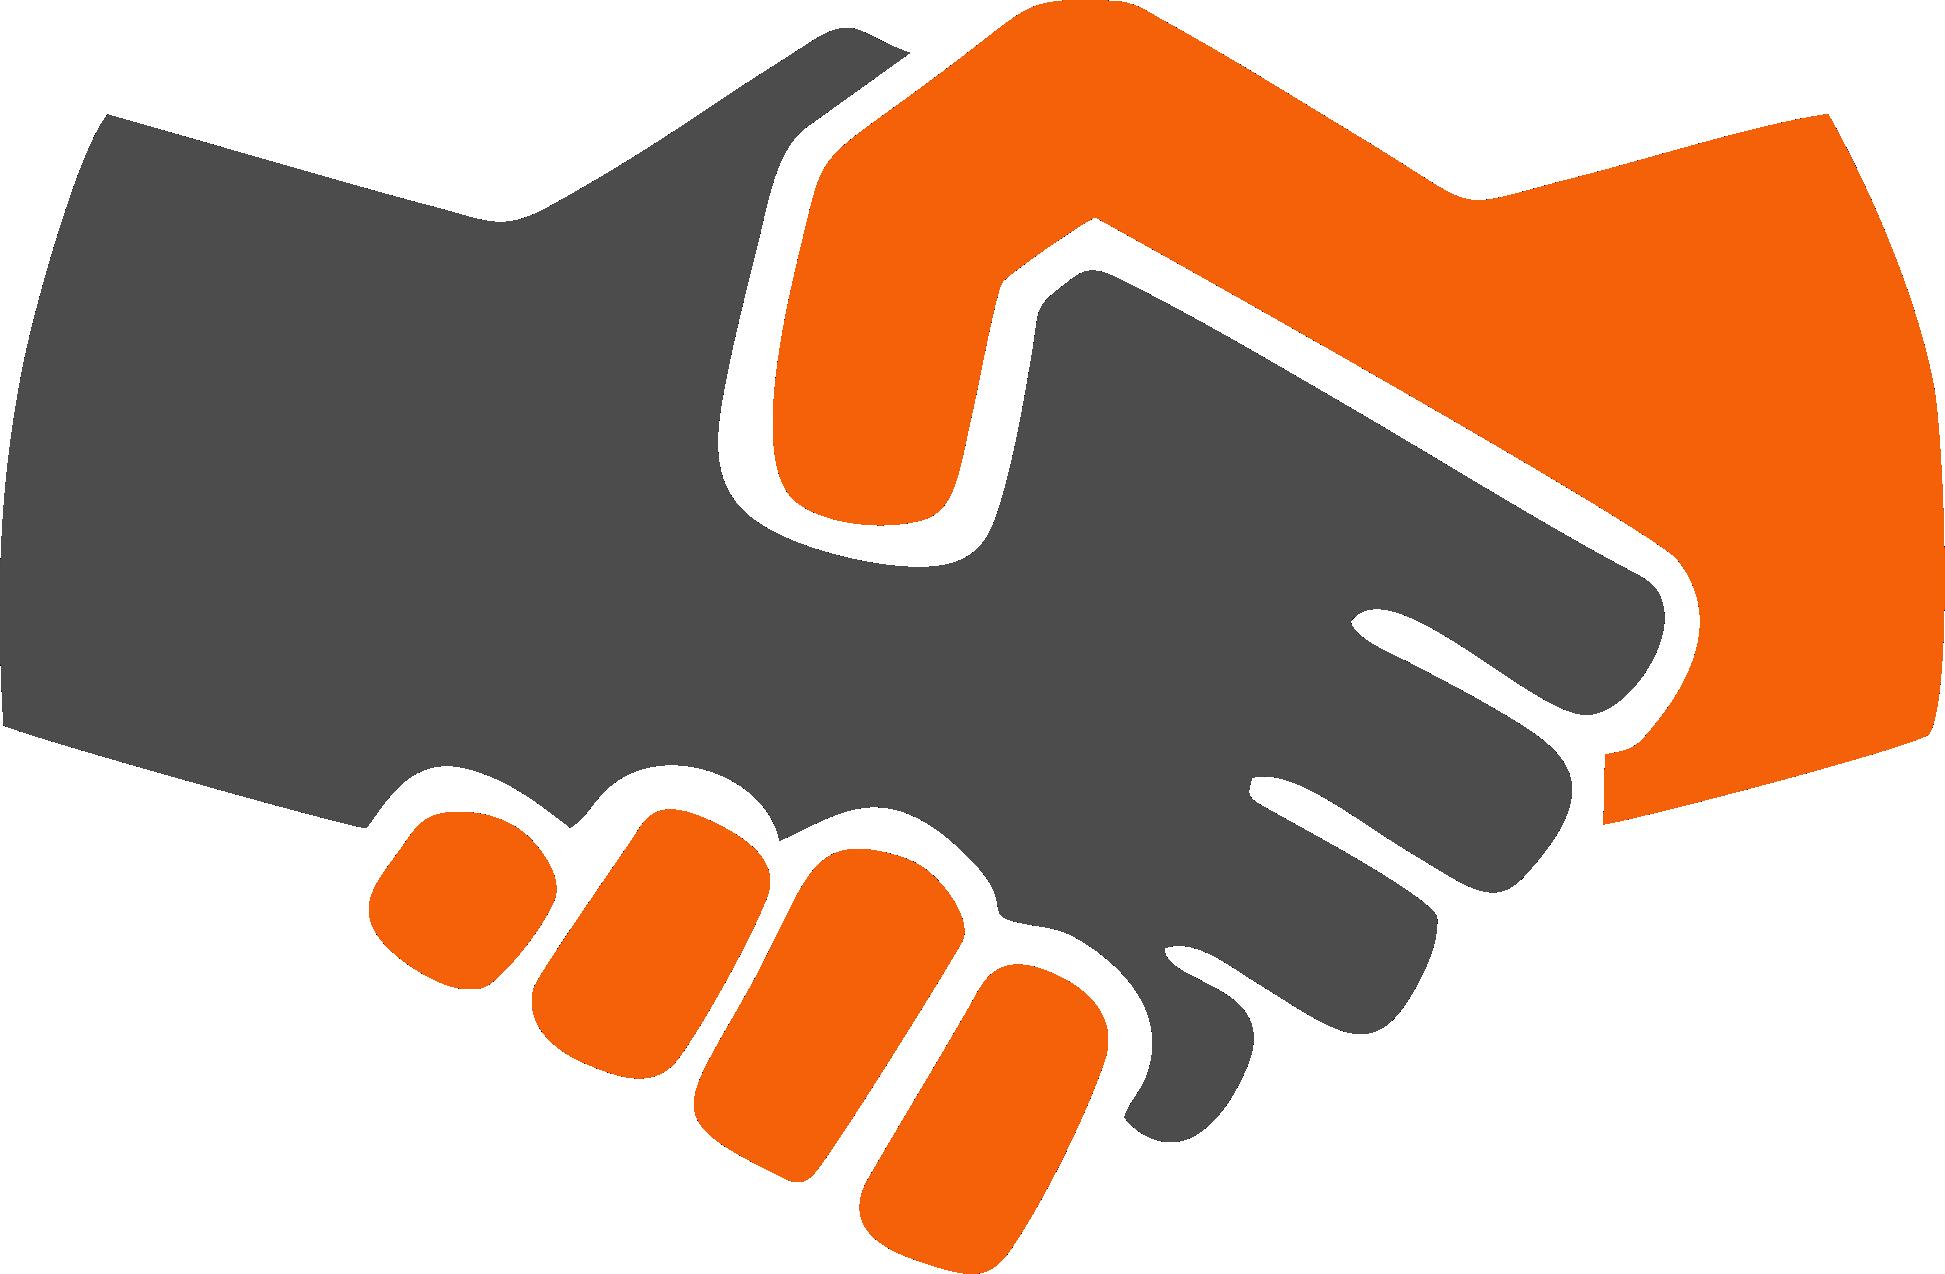 Handshake clipart commitment. Resurrection catholic church custom